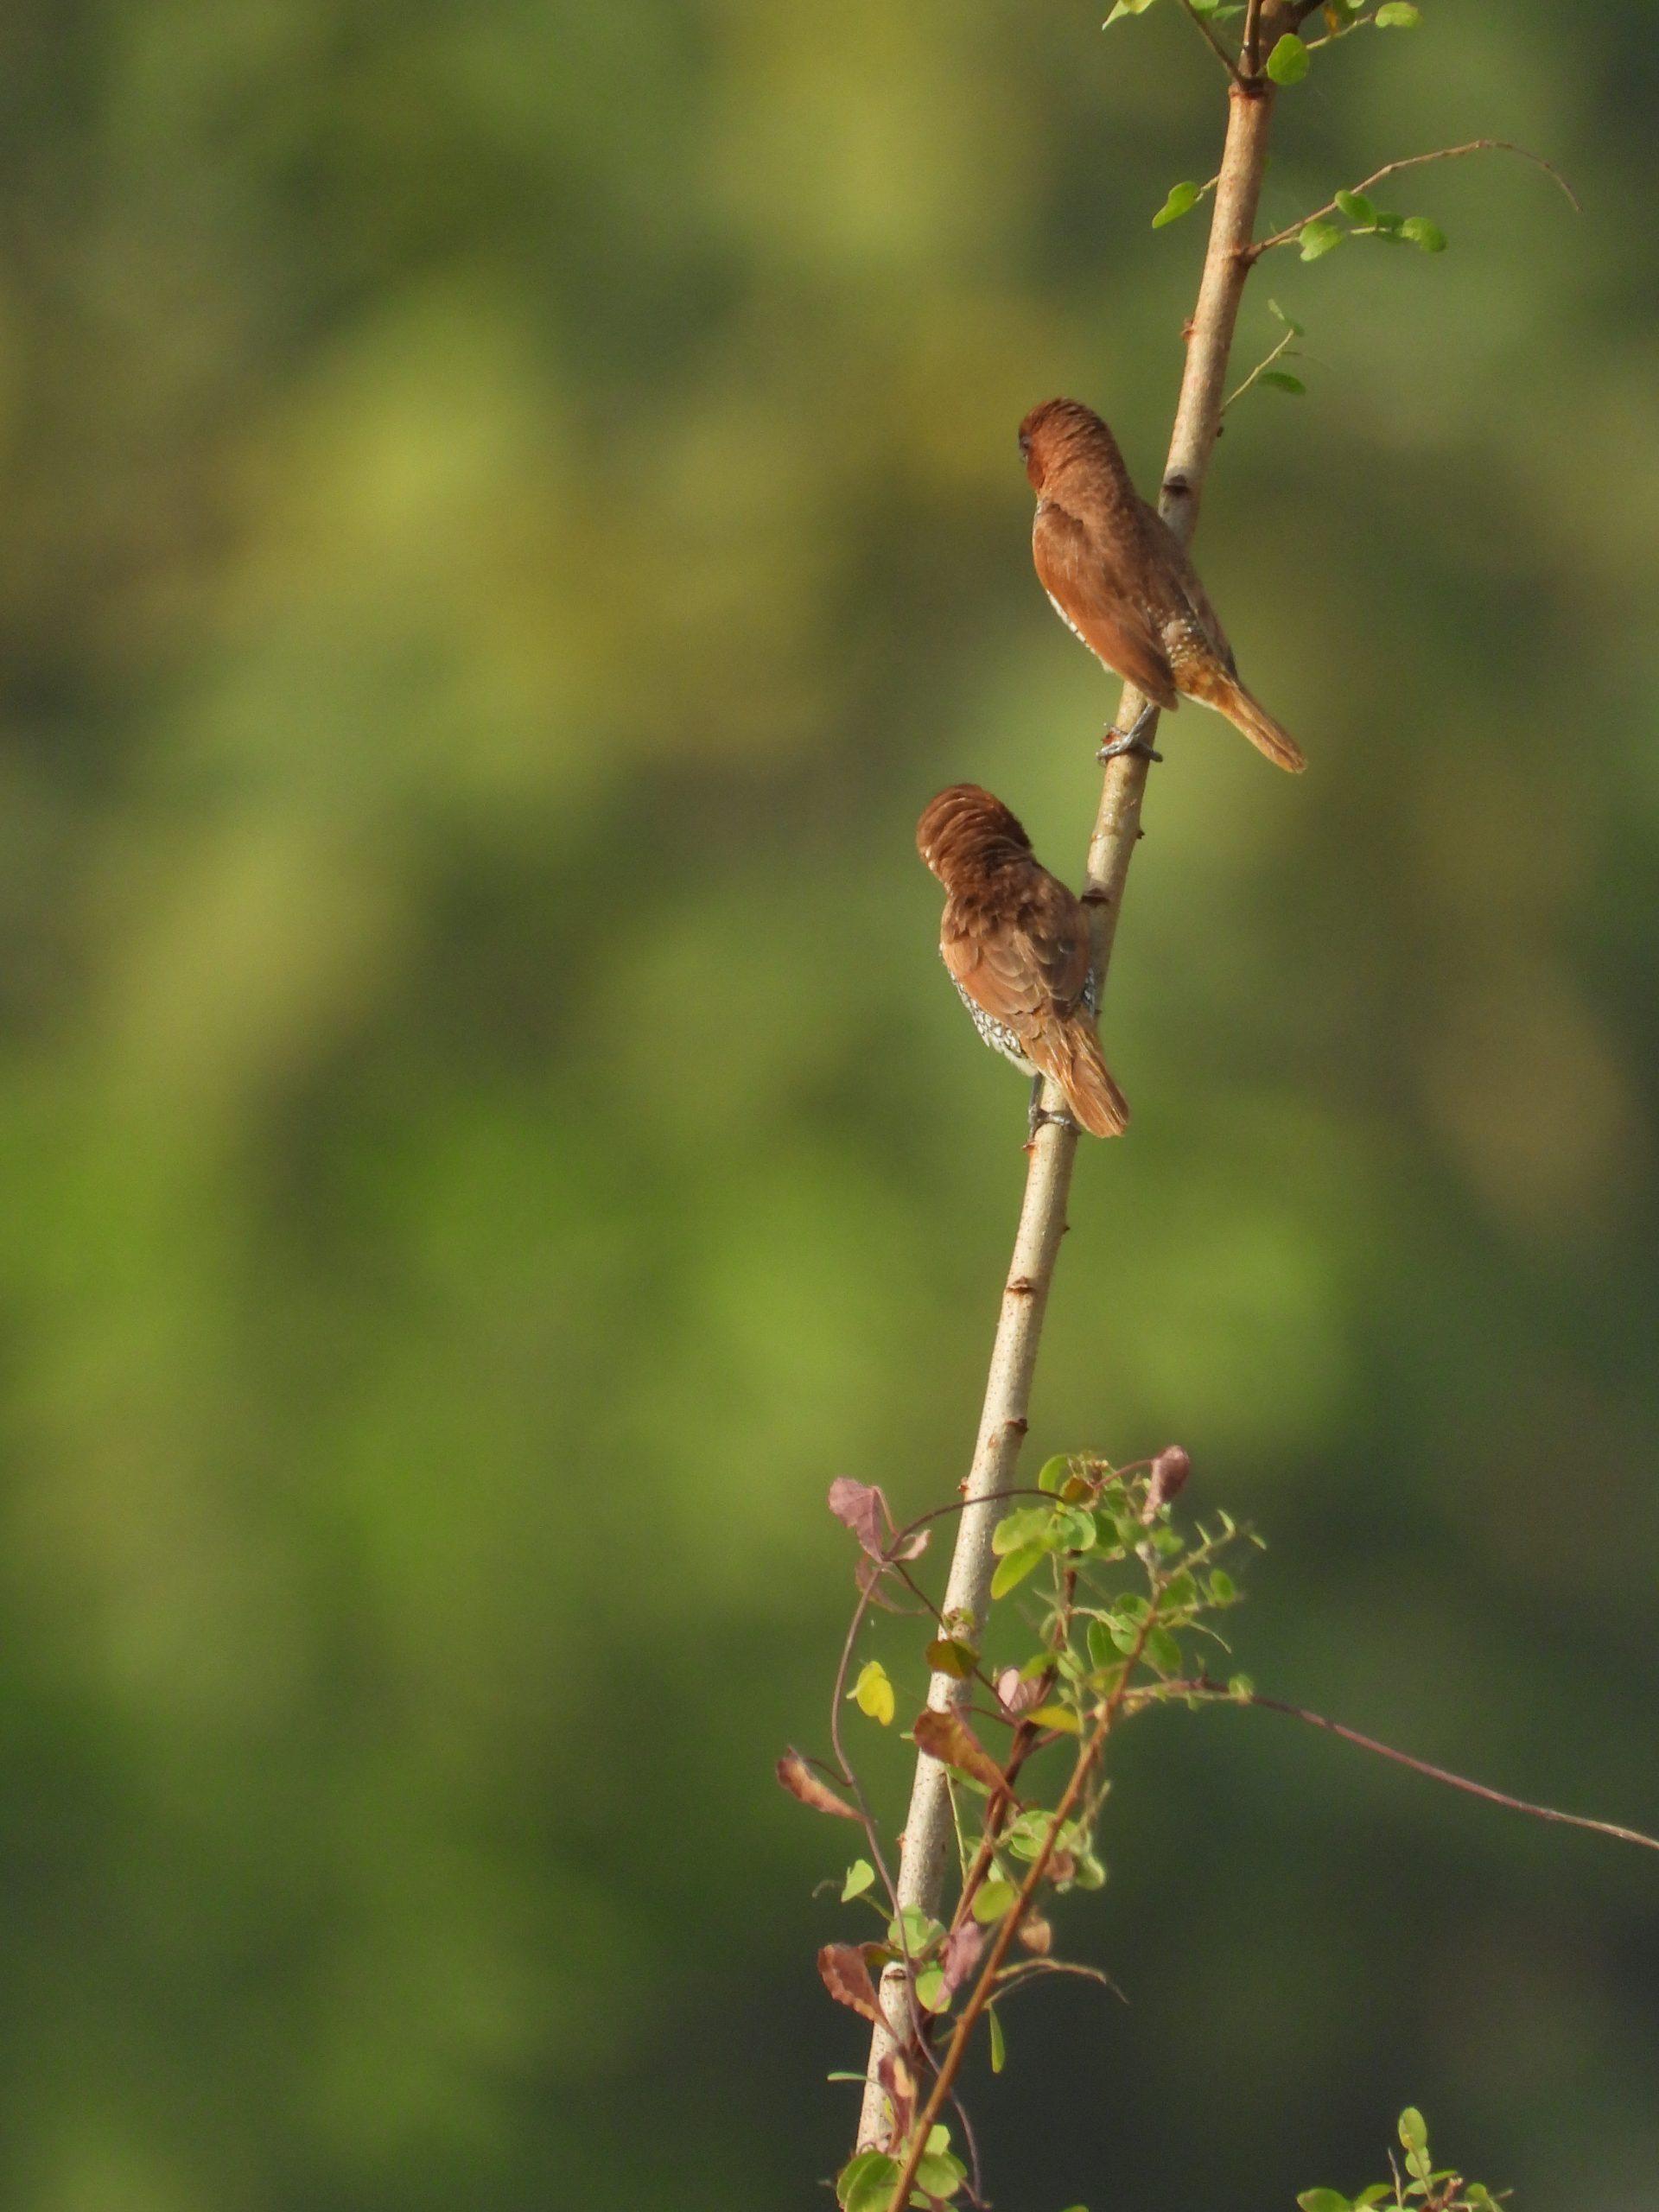 Birds sitting on plant